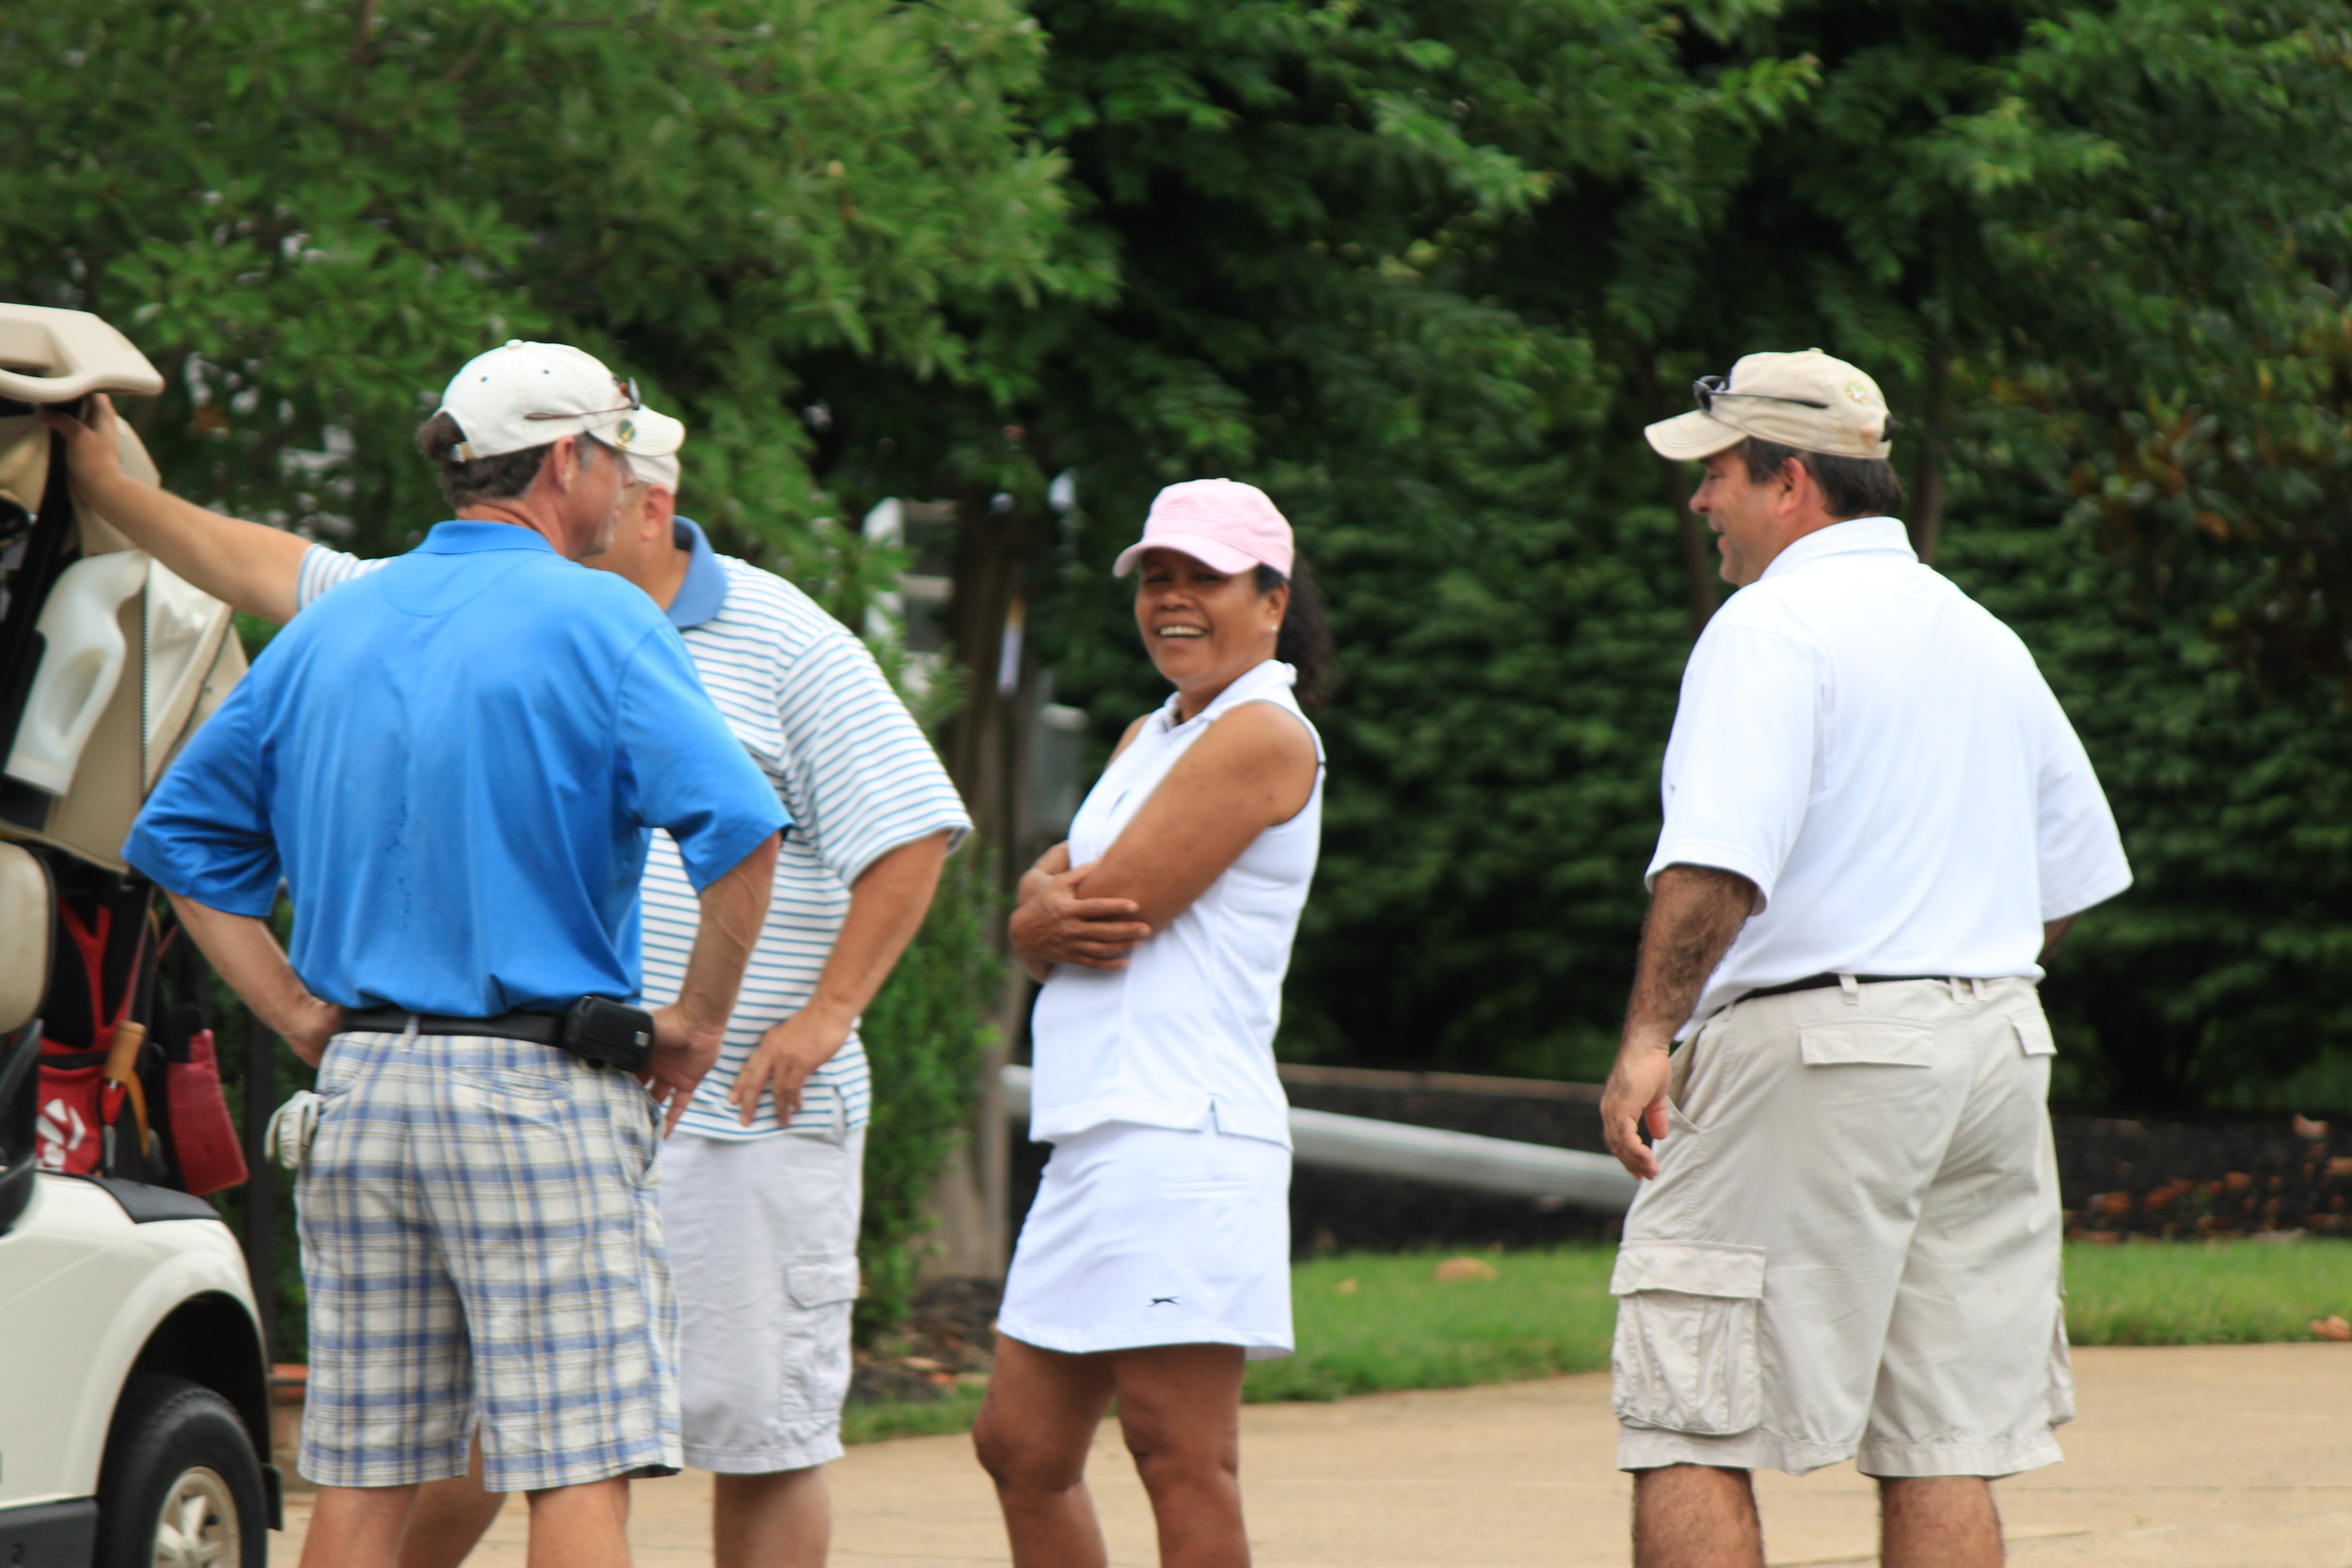 Dennis_Fitzgerald_Golf_Tournament_2011_IMG_3388.JPG